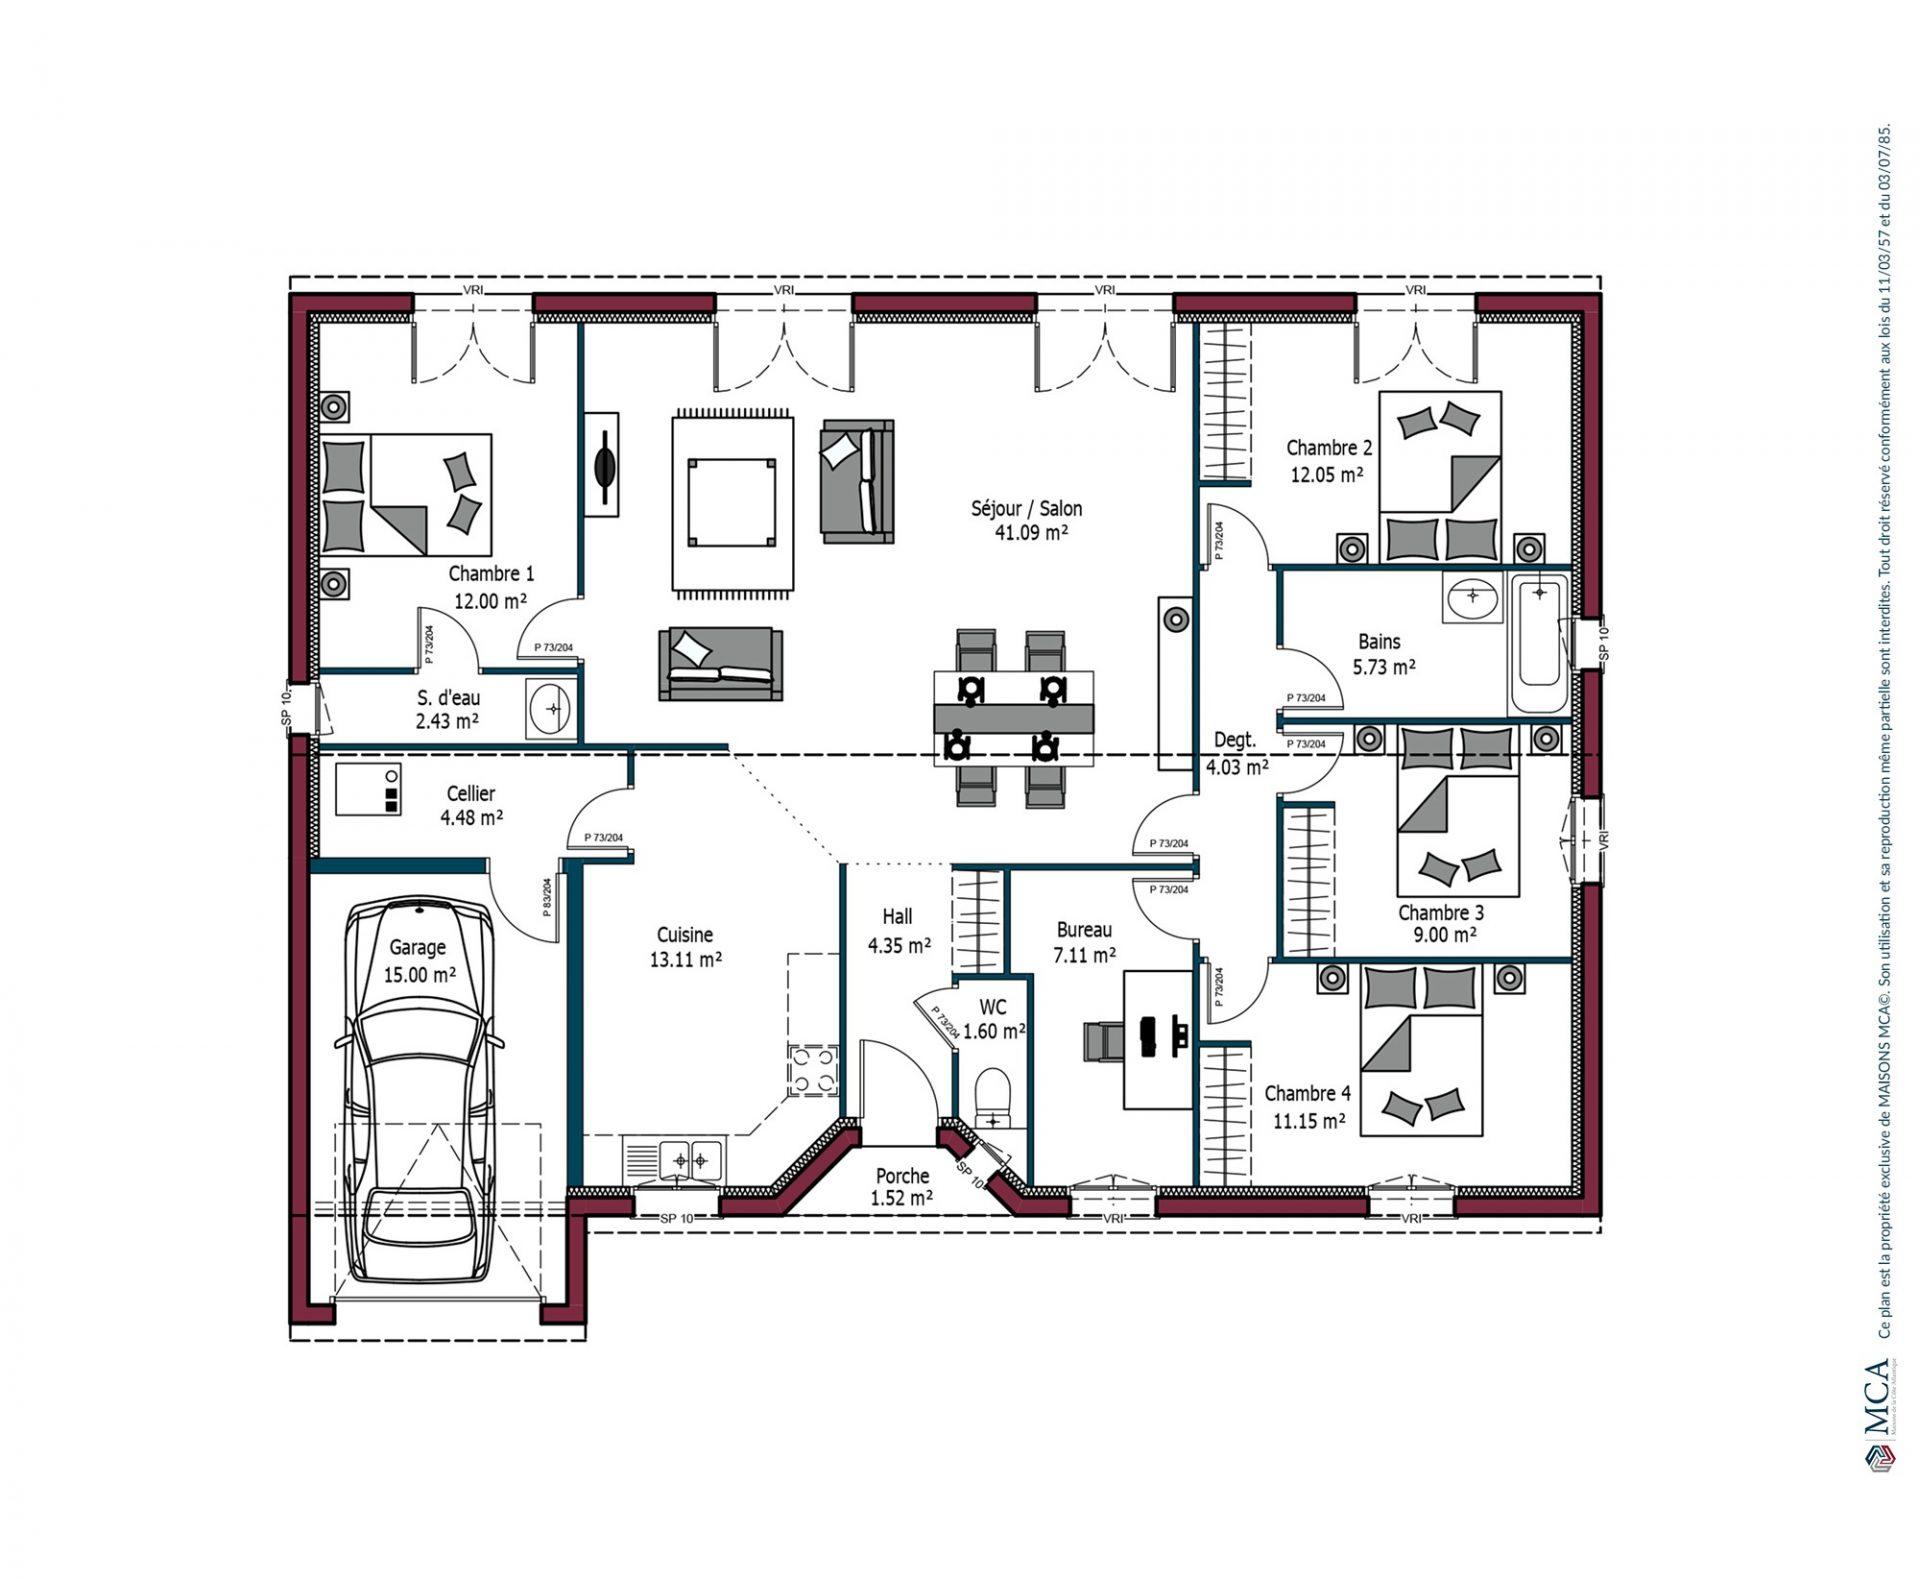 Plan Rochelle | 128 m²